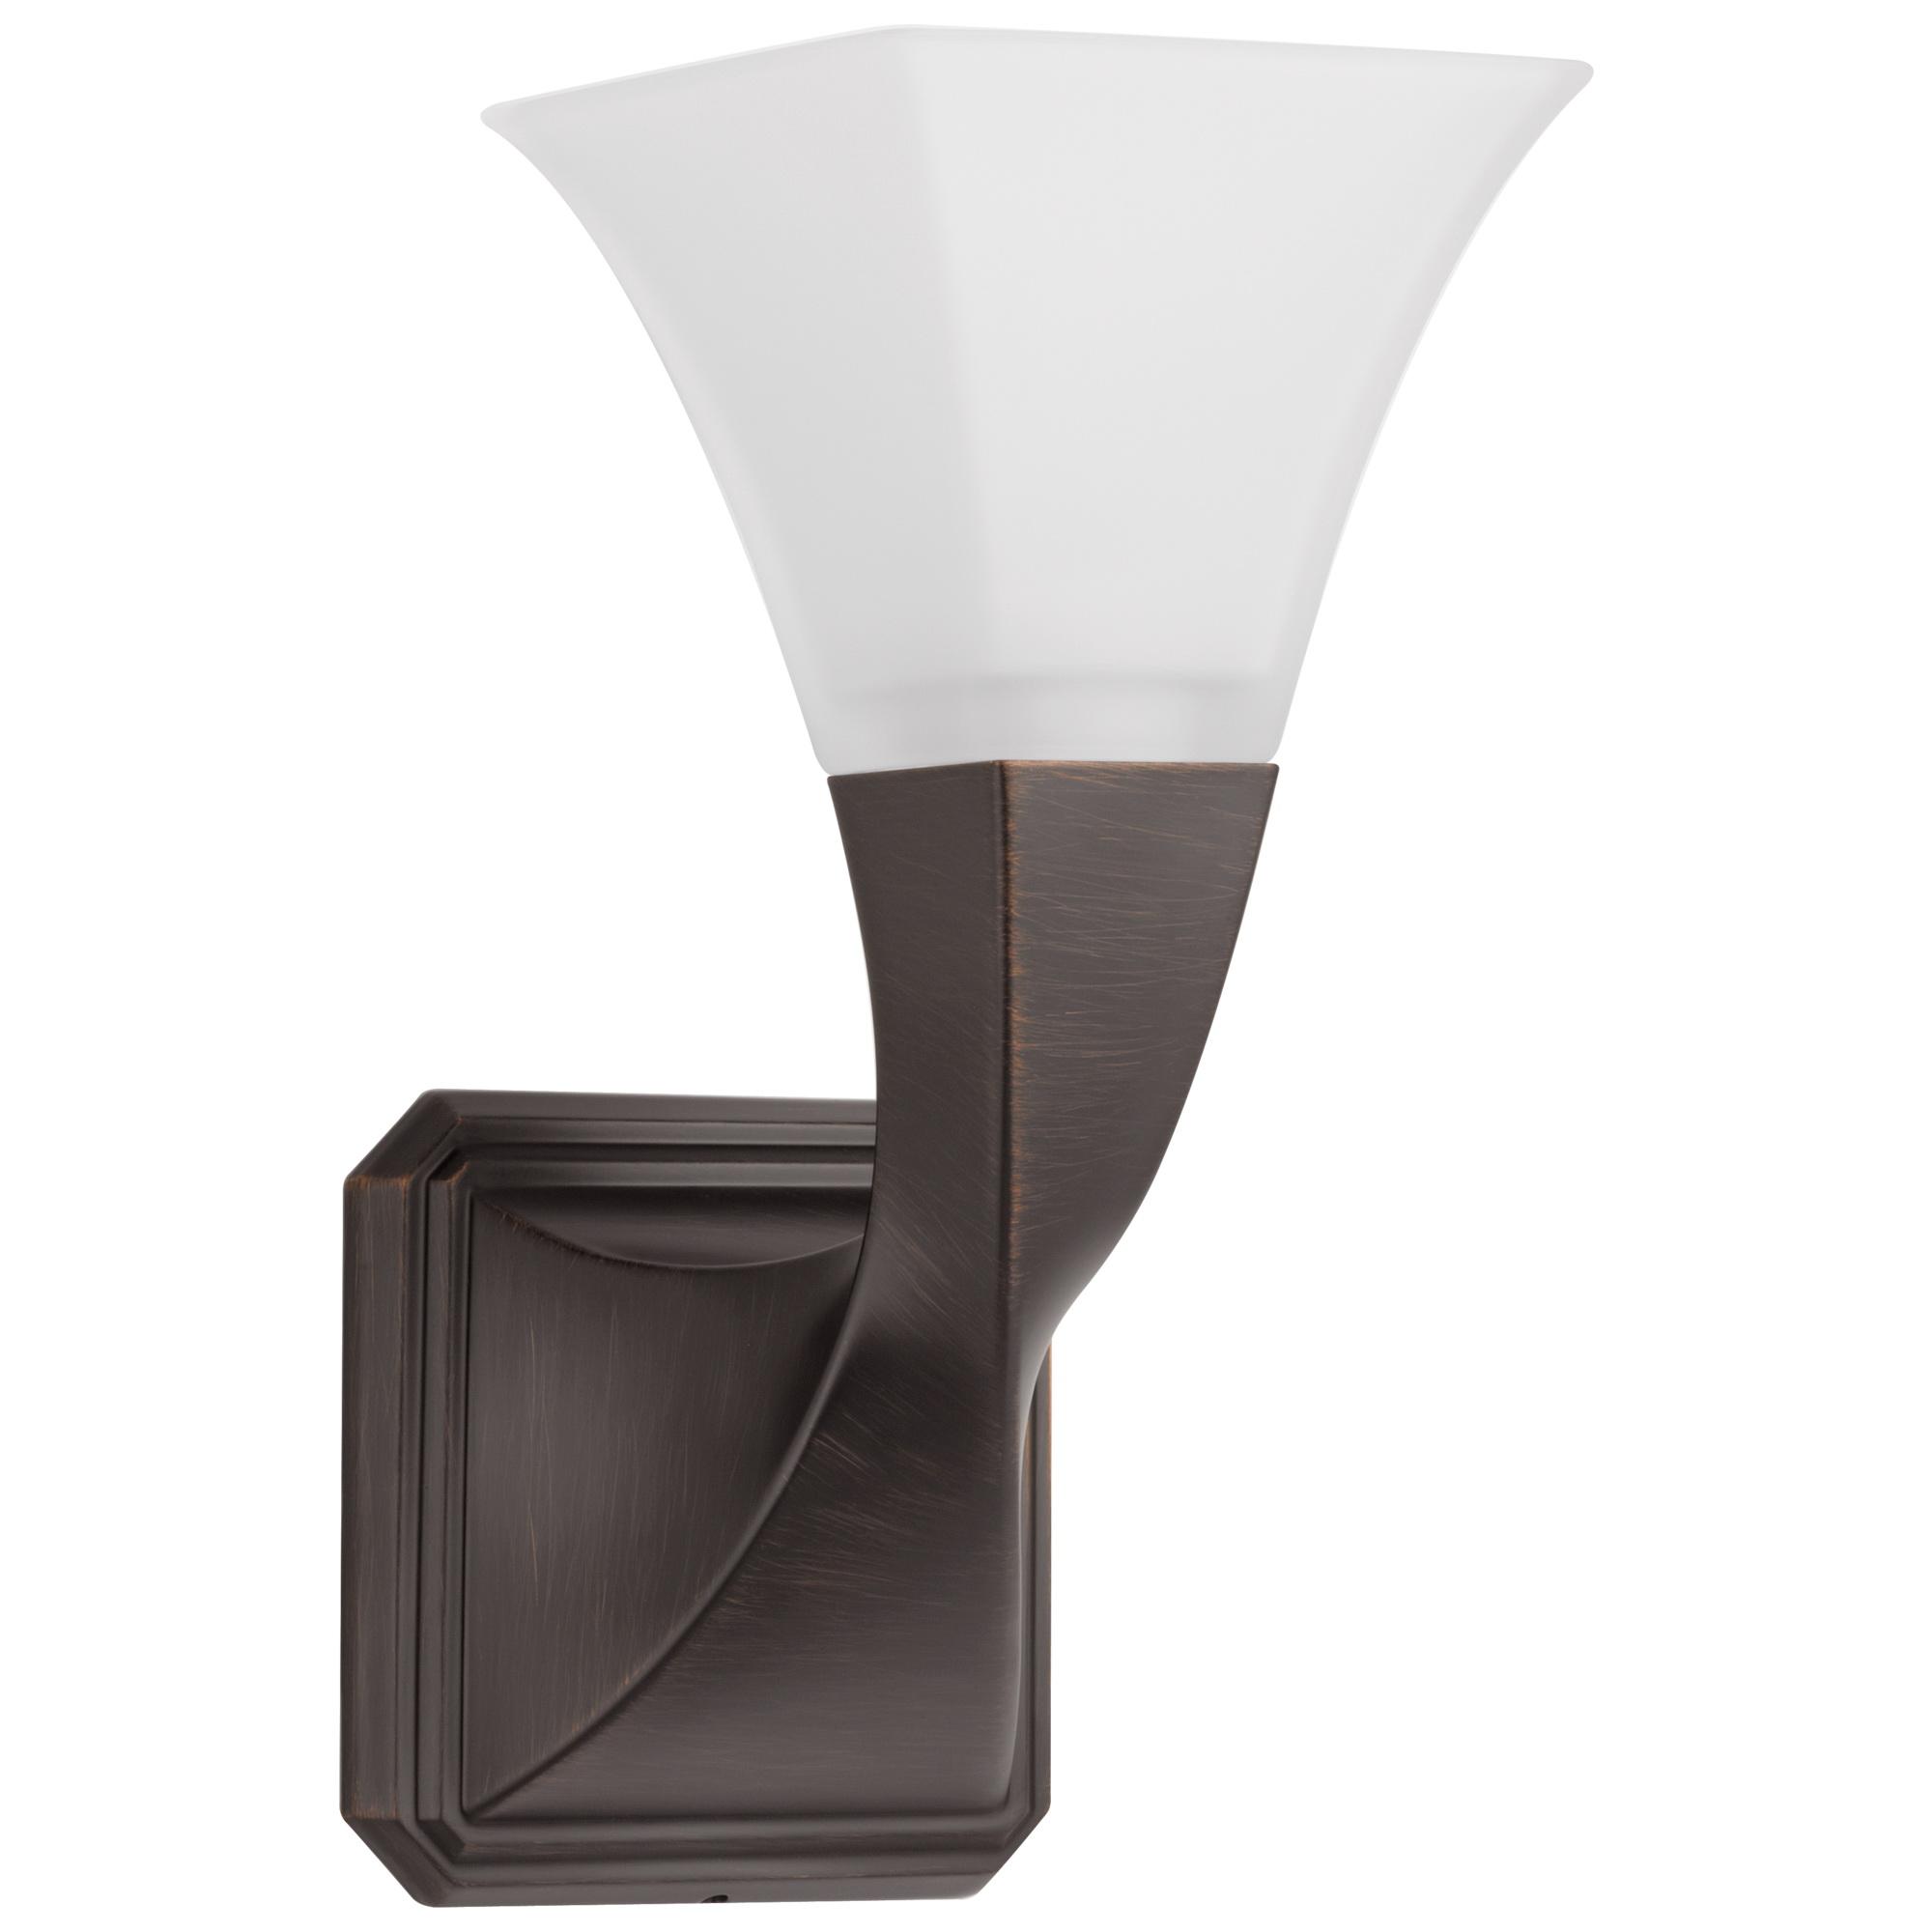 Brizo® 697030-RB Virage® Transitional Single Sconce Light, 120 VAC, Venetian Bronze, 1 Lamp, Import